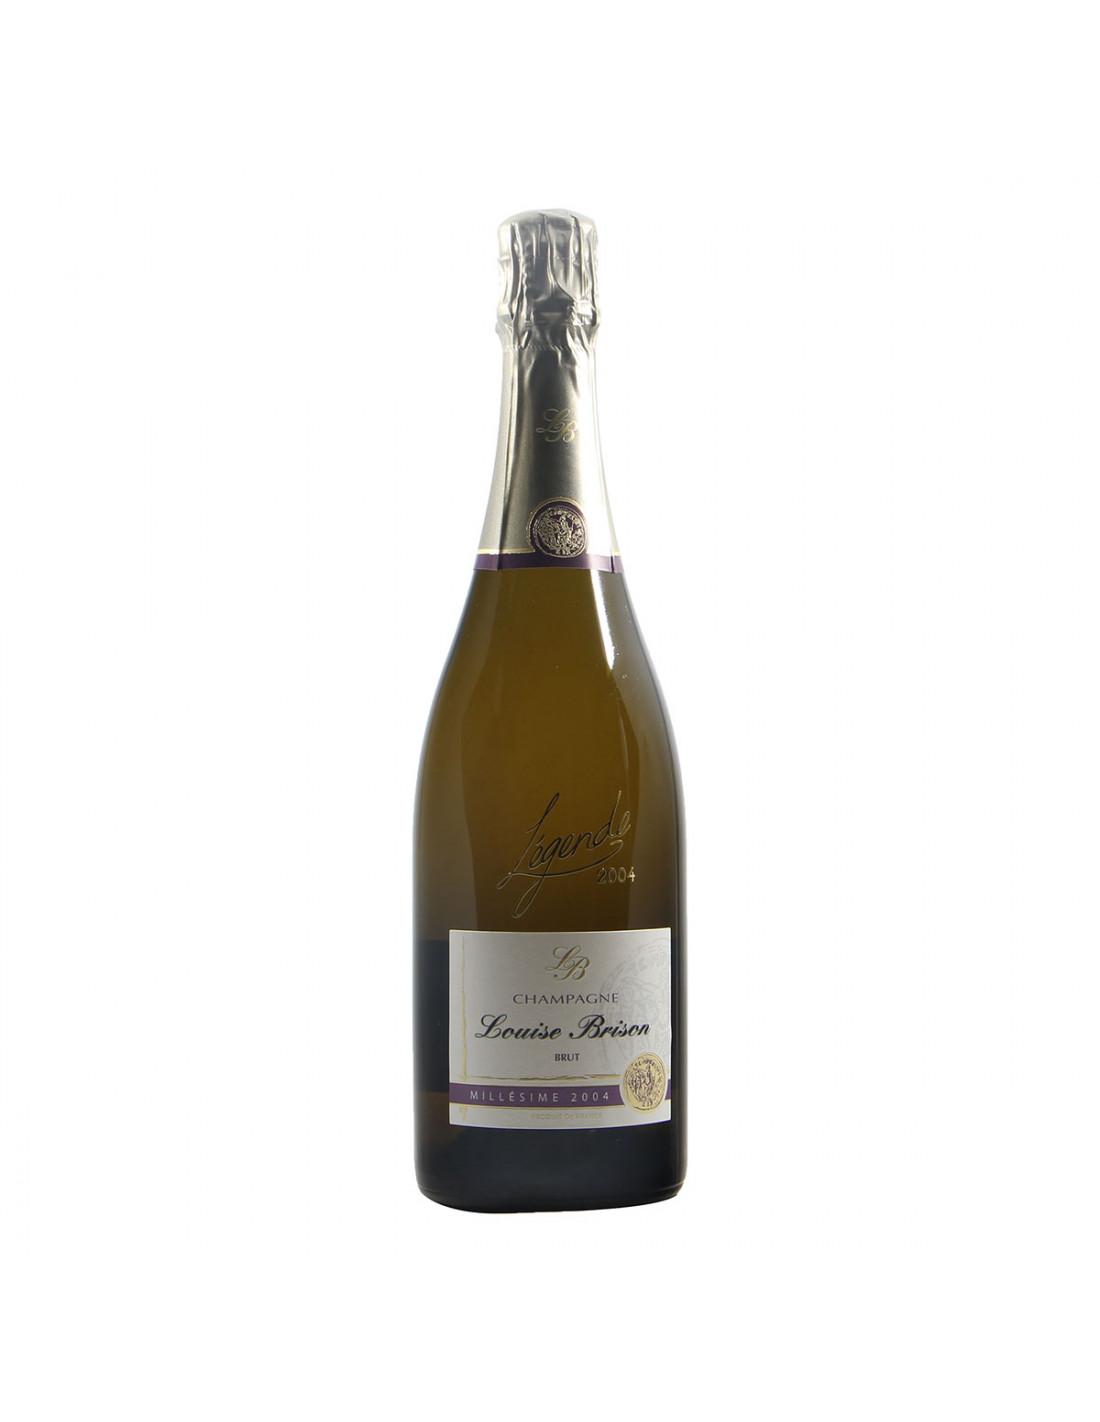 Louise Brison Champagne Zero Dosage Legende Millesime 2004 Grandi Bottiglie